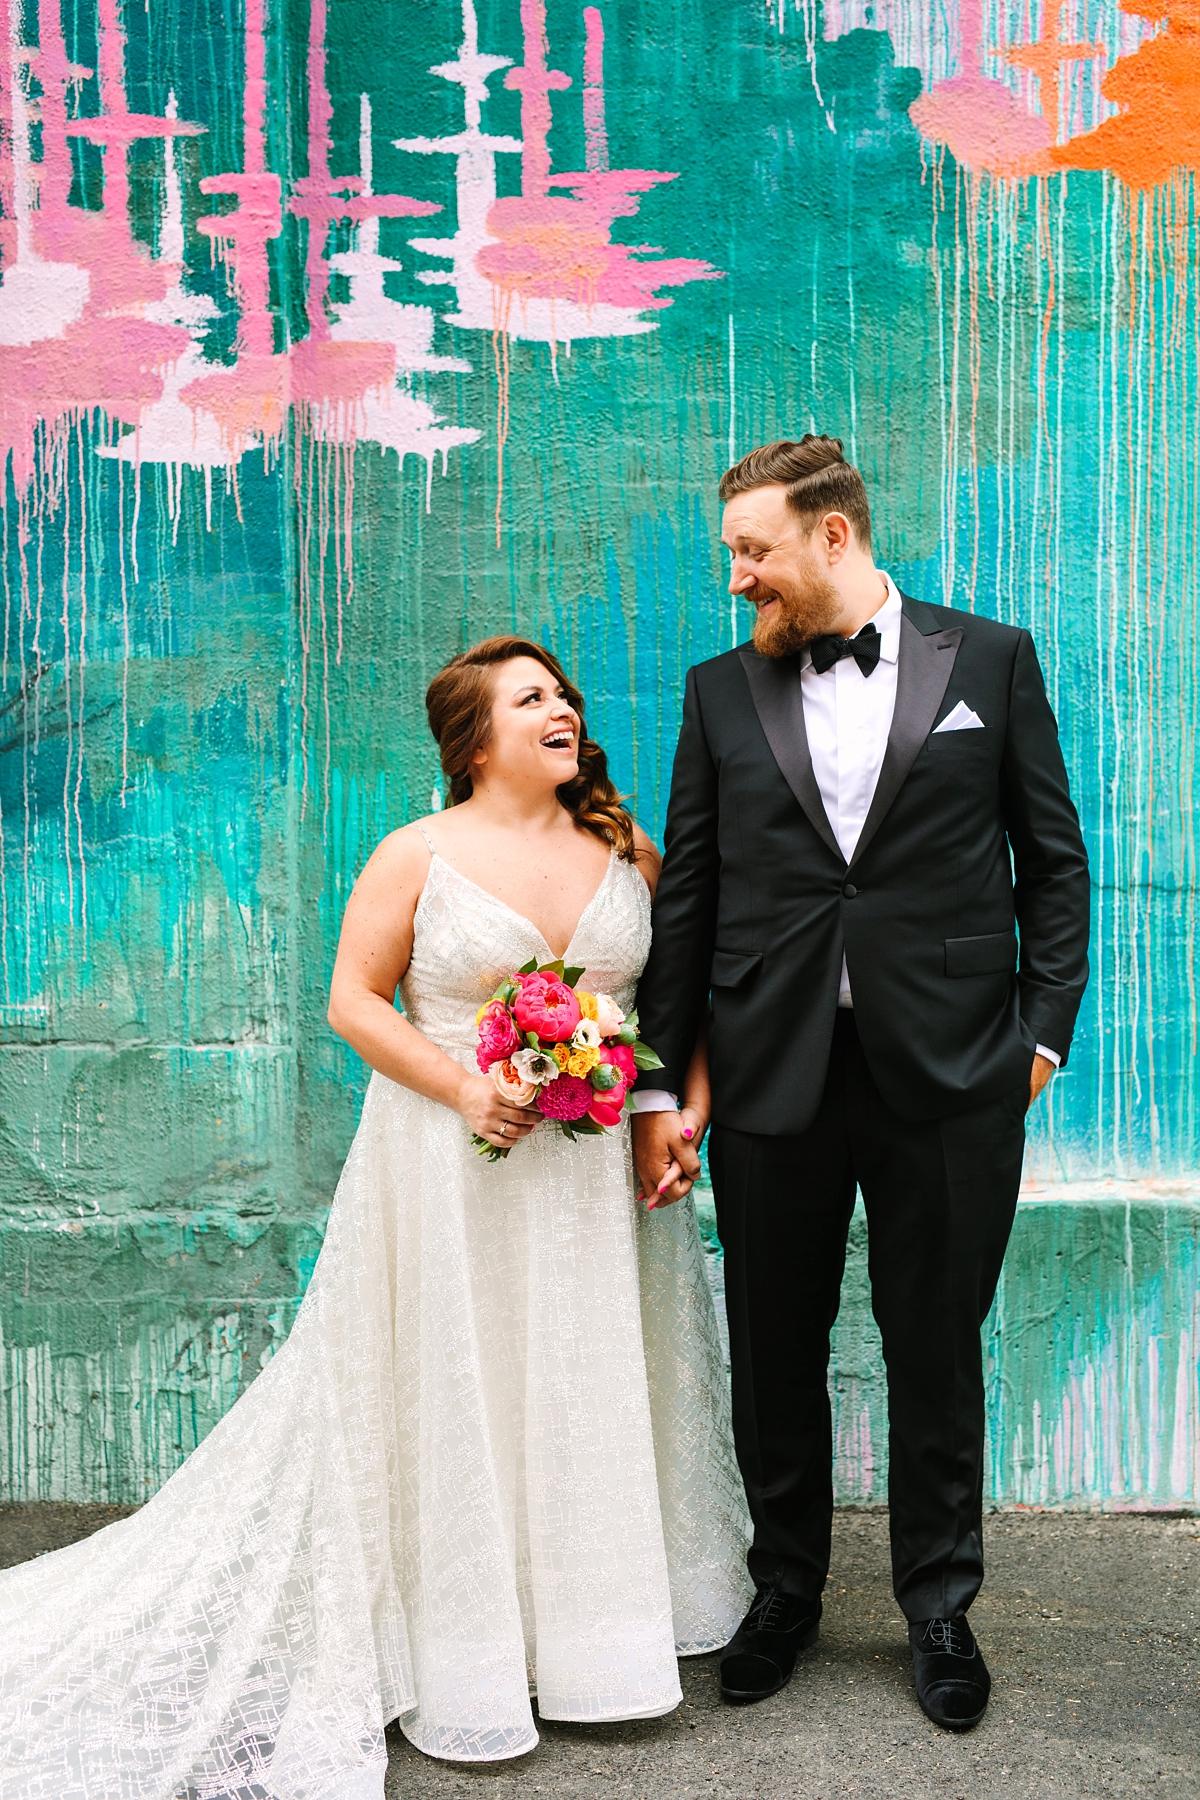 Colourful fun wedding Lazaro Perez curvy bride wedding dress  - A Stunning Curvy Bride + Her Colourful + Fun Tinder Love Story Wedding